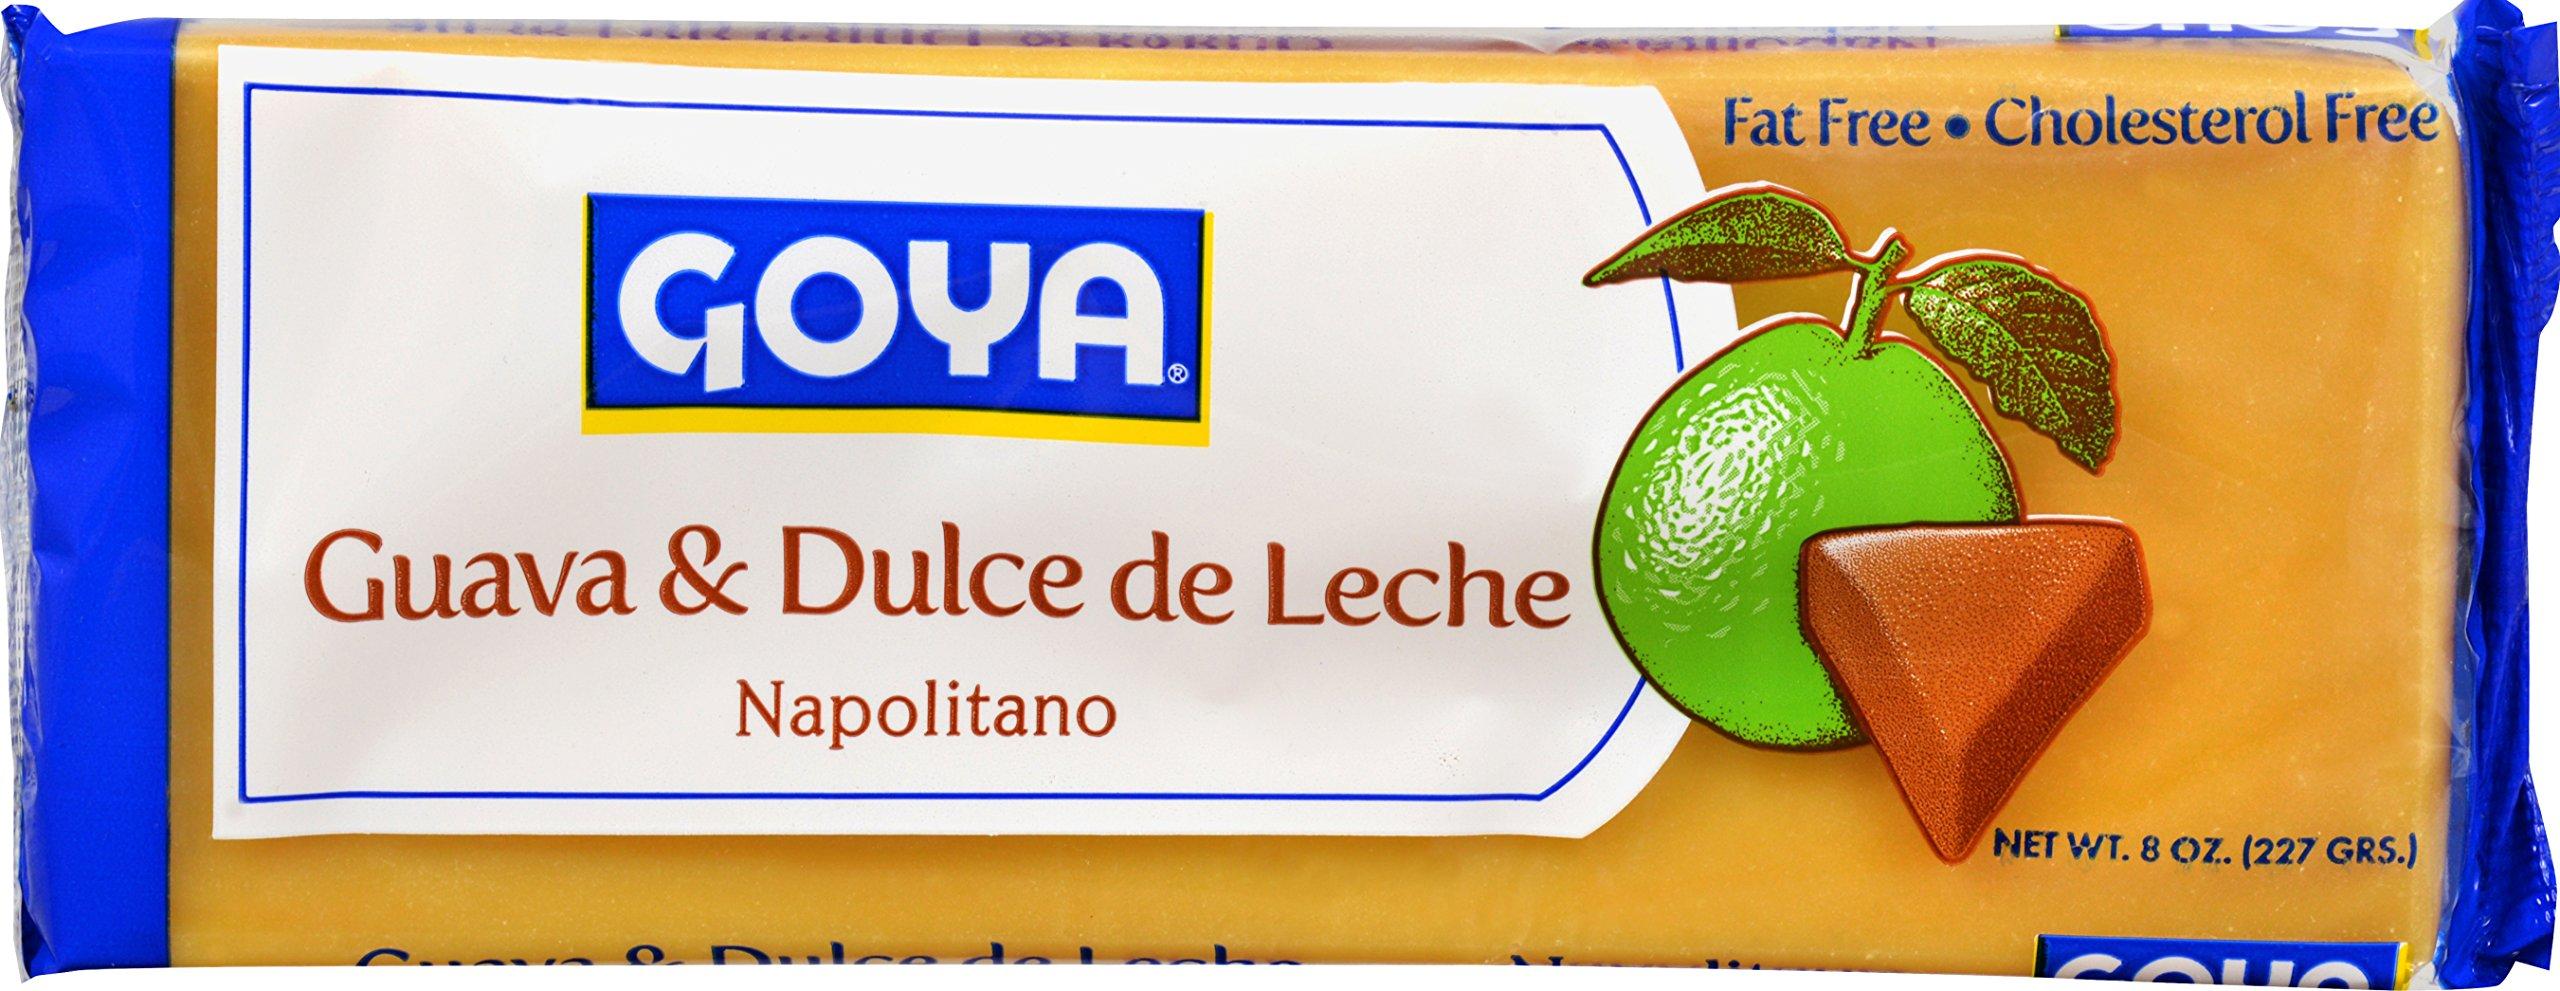 Goya Foods Napolitano Guava & Dulce De Leche, 8 Ounce (pack of 12)